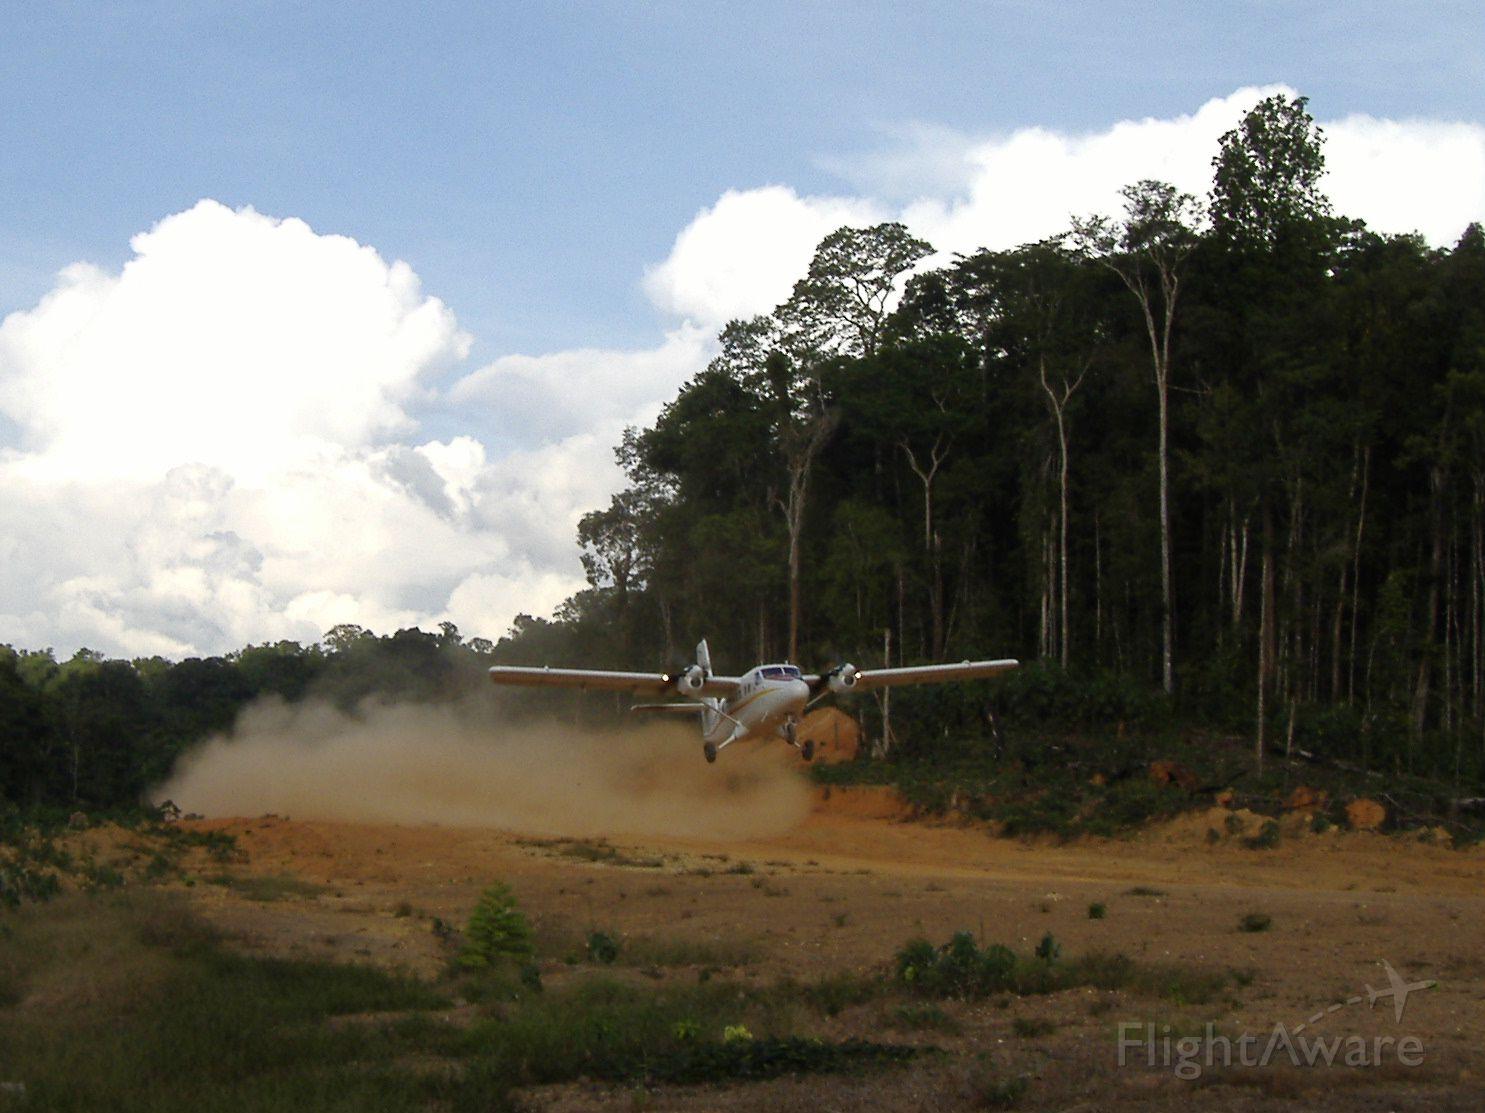 De Havilland Canada Twin Otter (PZ-TBW) - Twinotter departing Tossokreek - Suriname